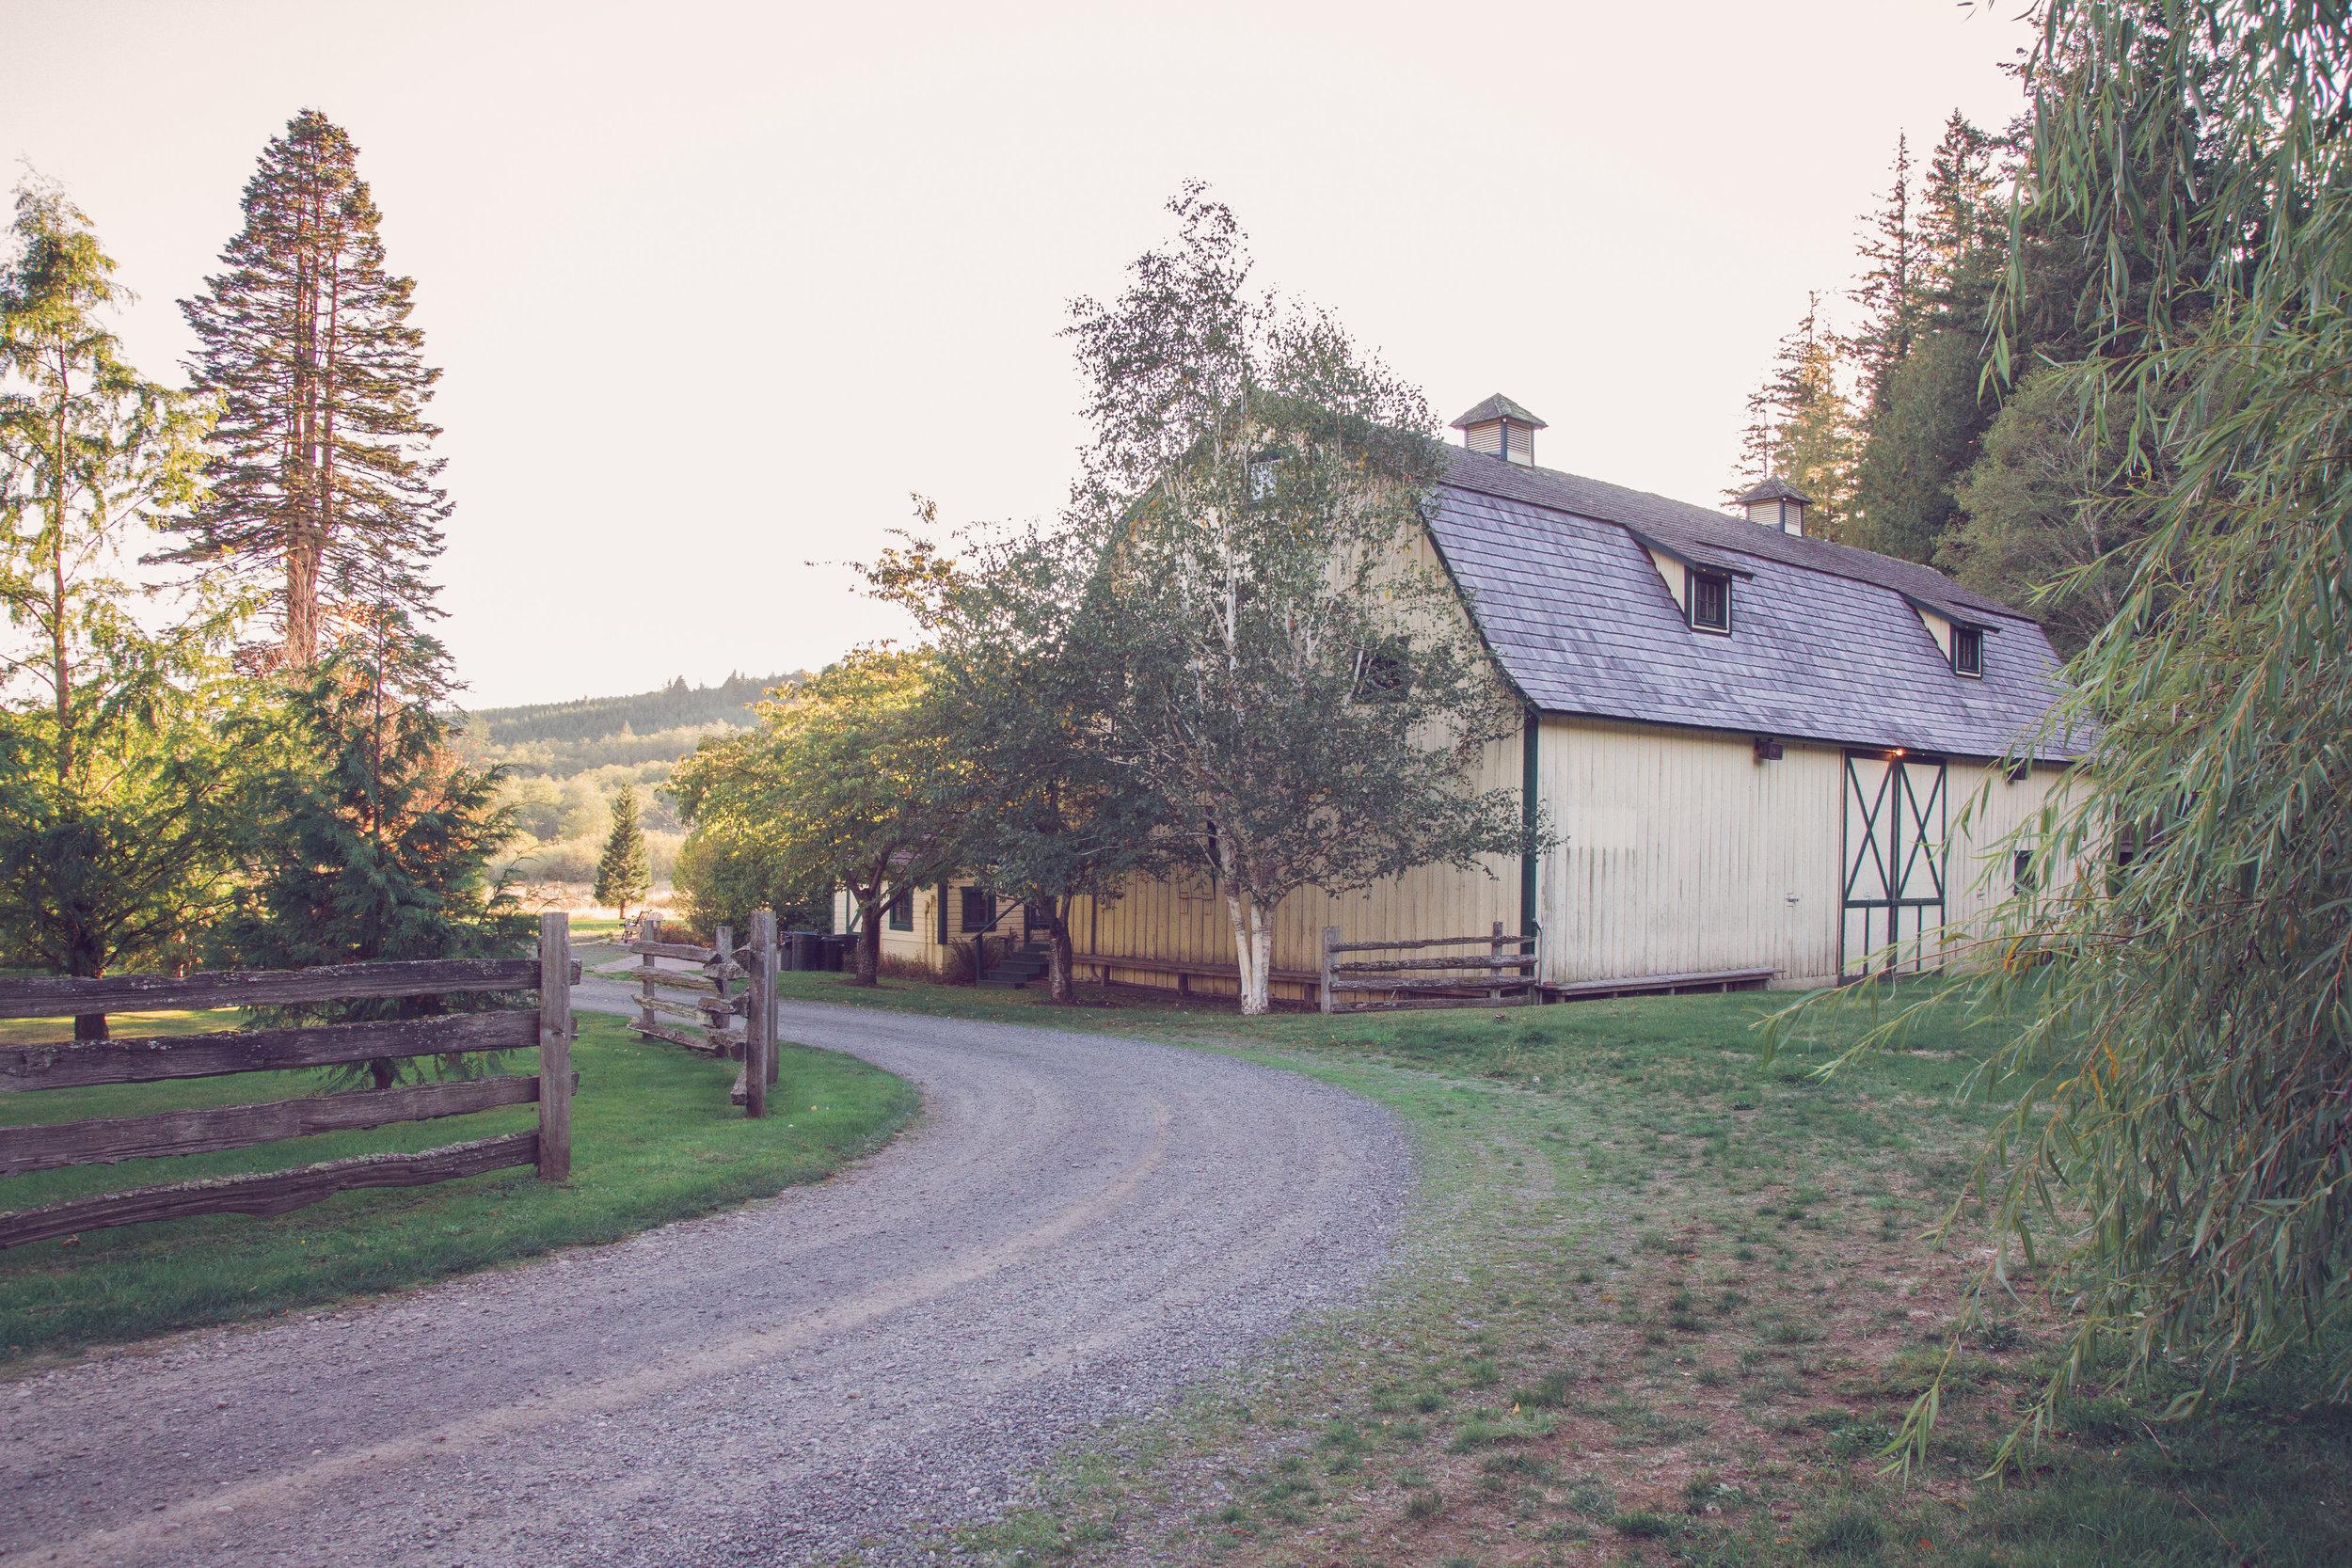 The Barn-0008.jpg